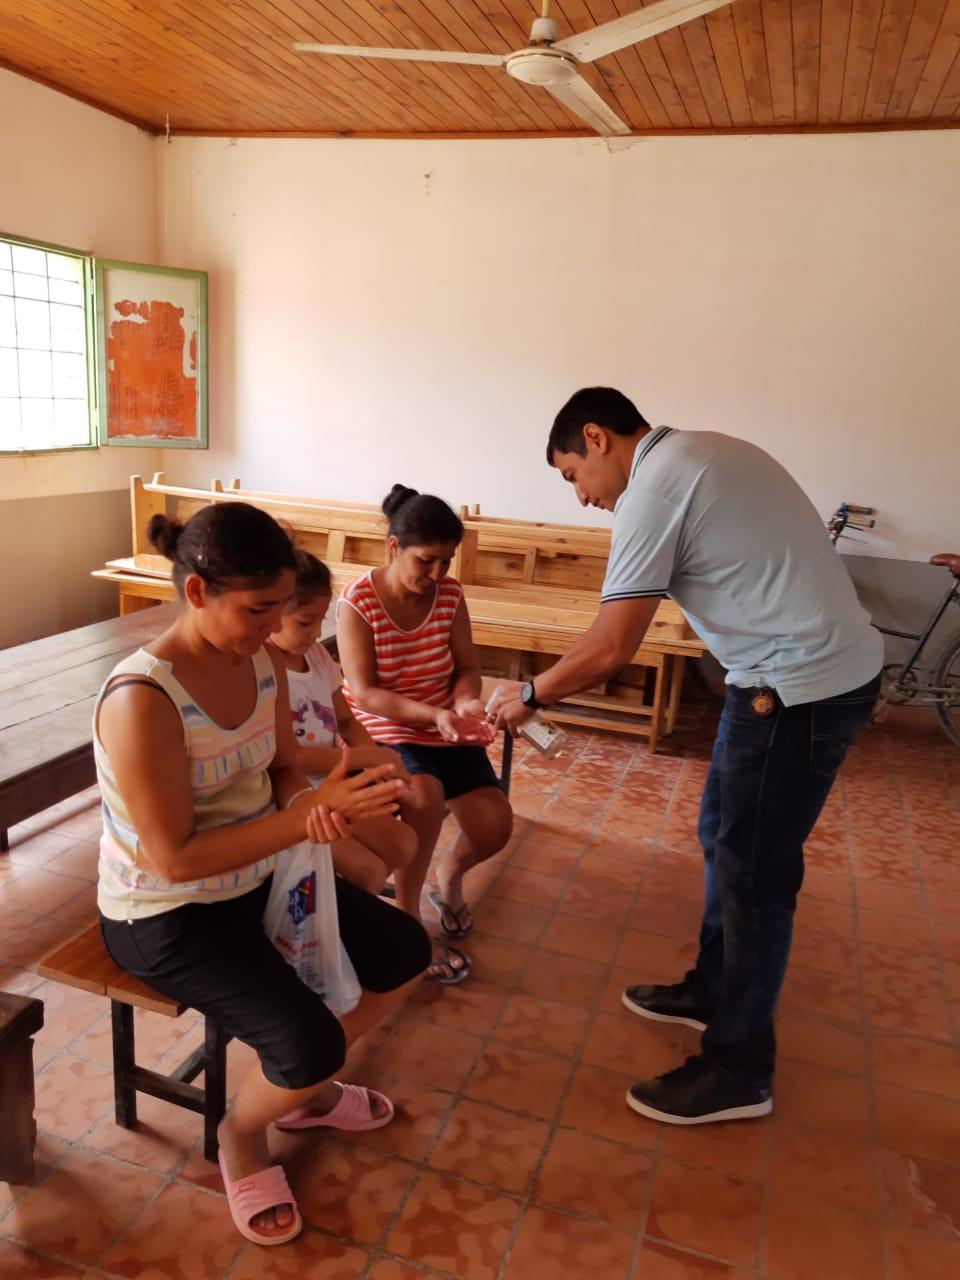 Distribuyen elementos de higiene en comedores y merenderos